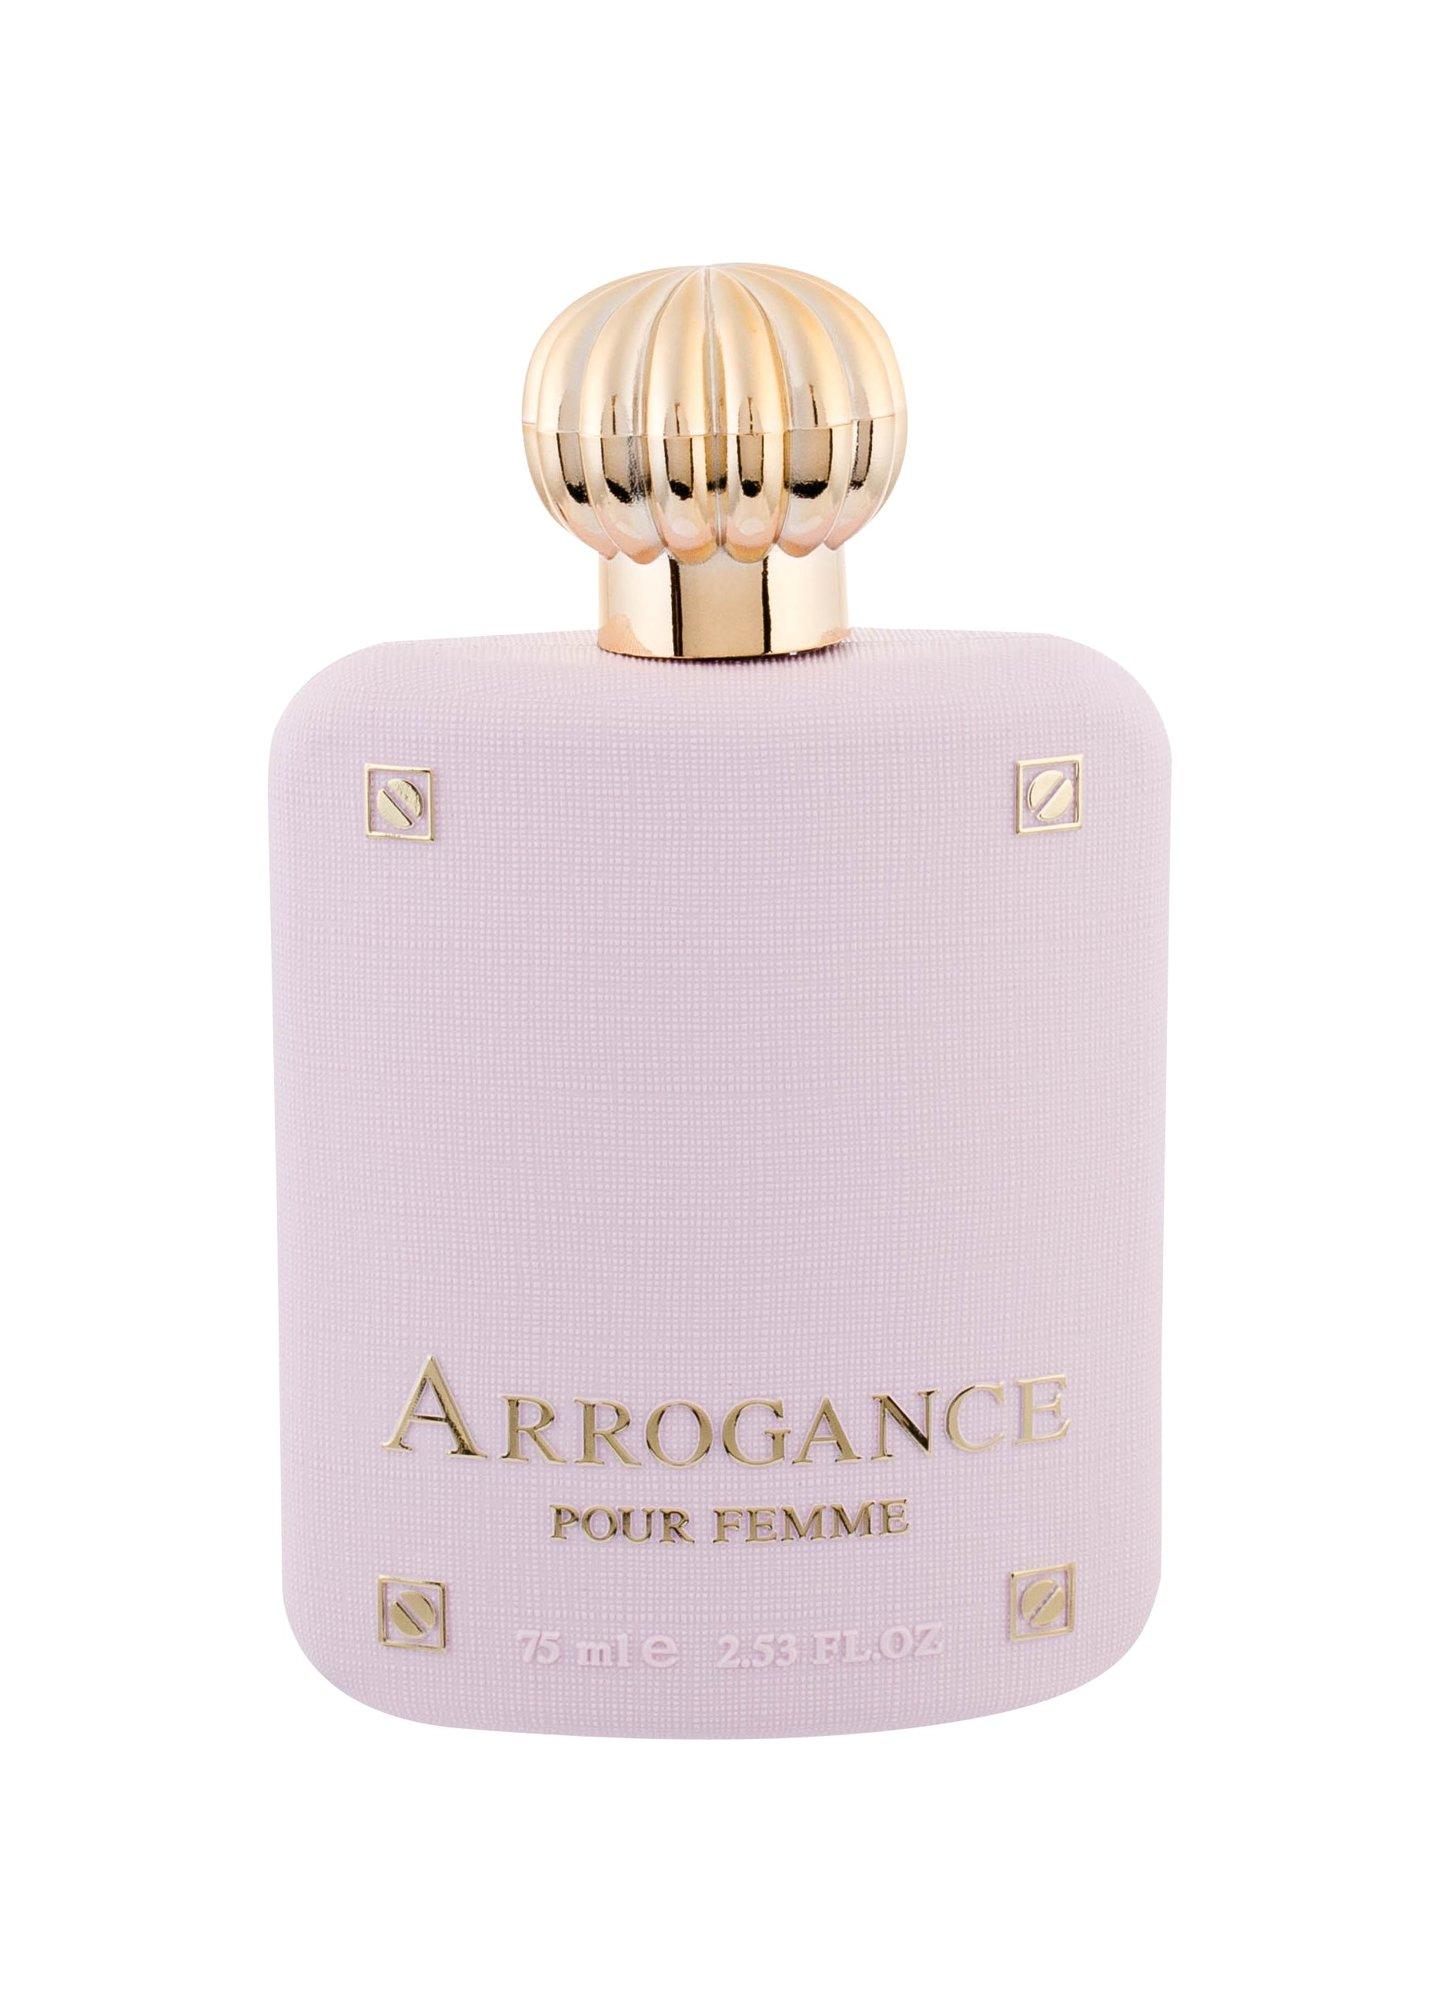 Arrogance Arrogance Femme Eau de Toilette 75ml